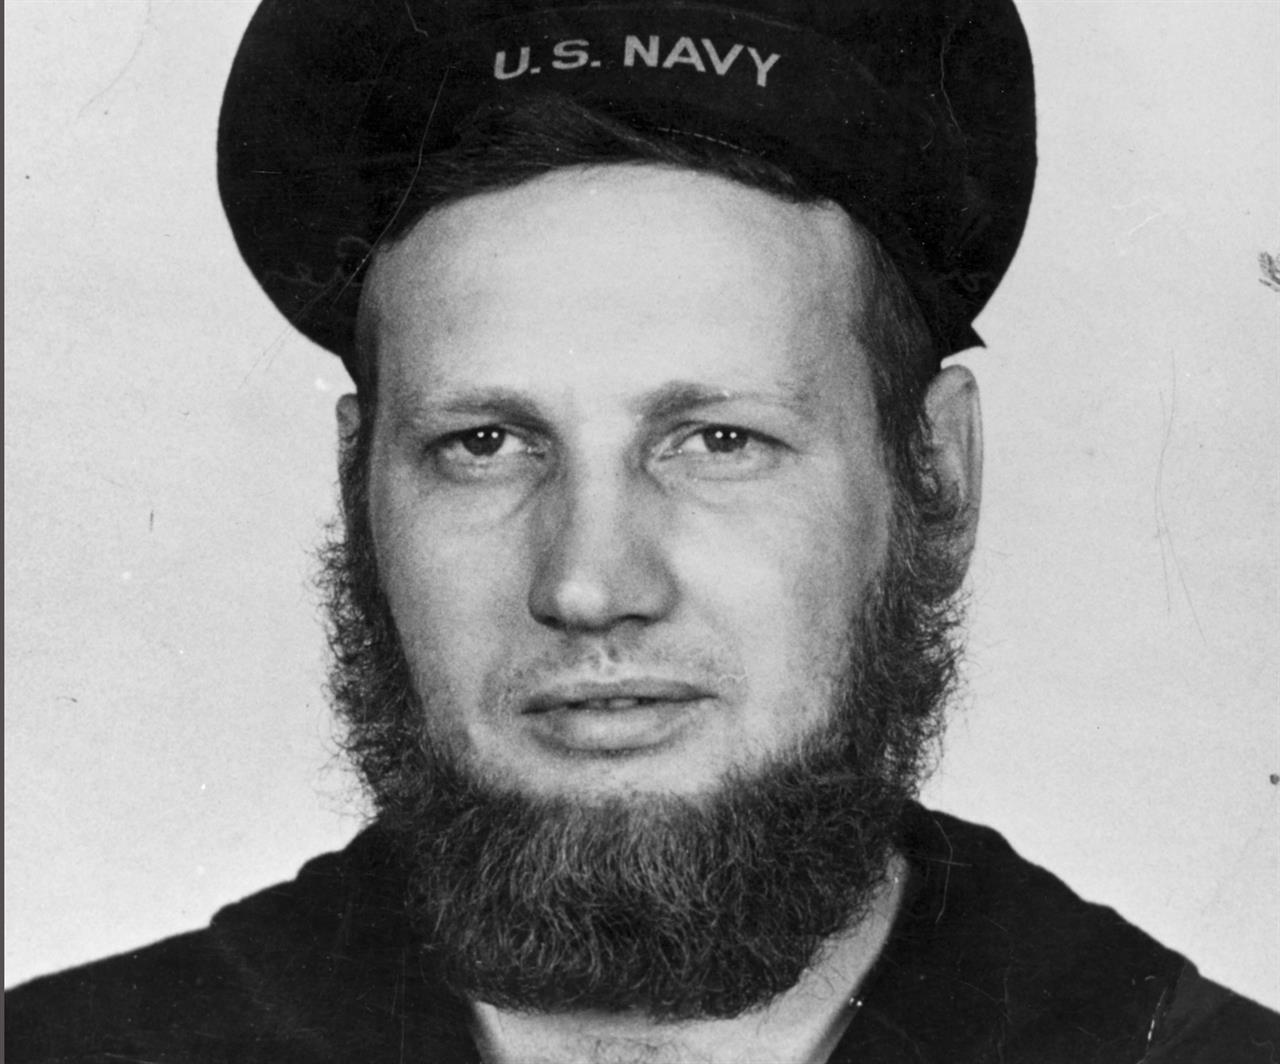 U Beard A hairy issue: Sailors...